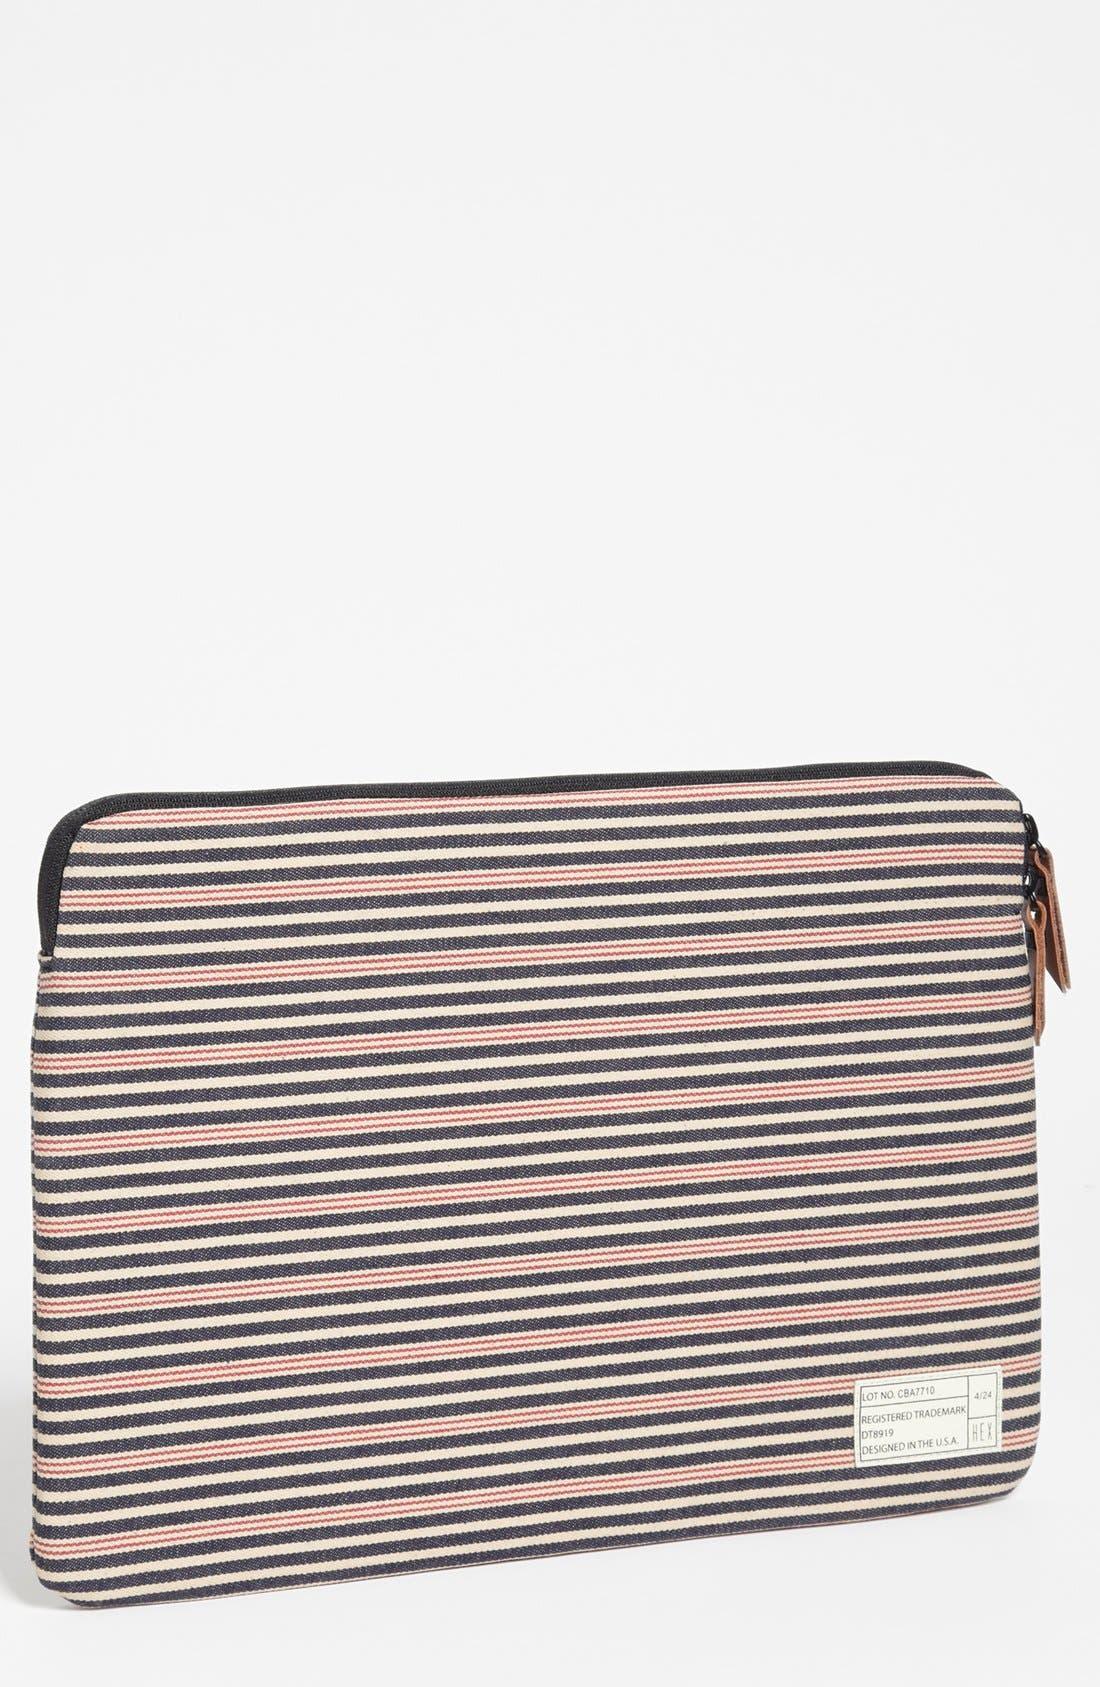 Alternate Image 1 Selected - HEX 'Cabana' MacBook Air Sleeve (13 Inch)